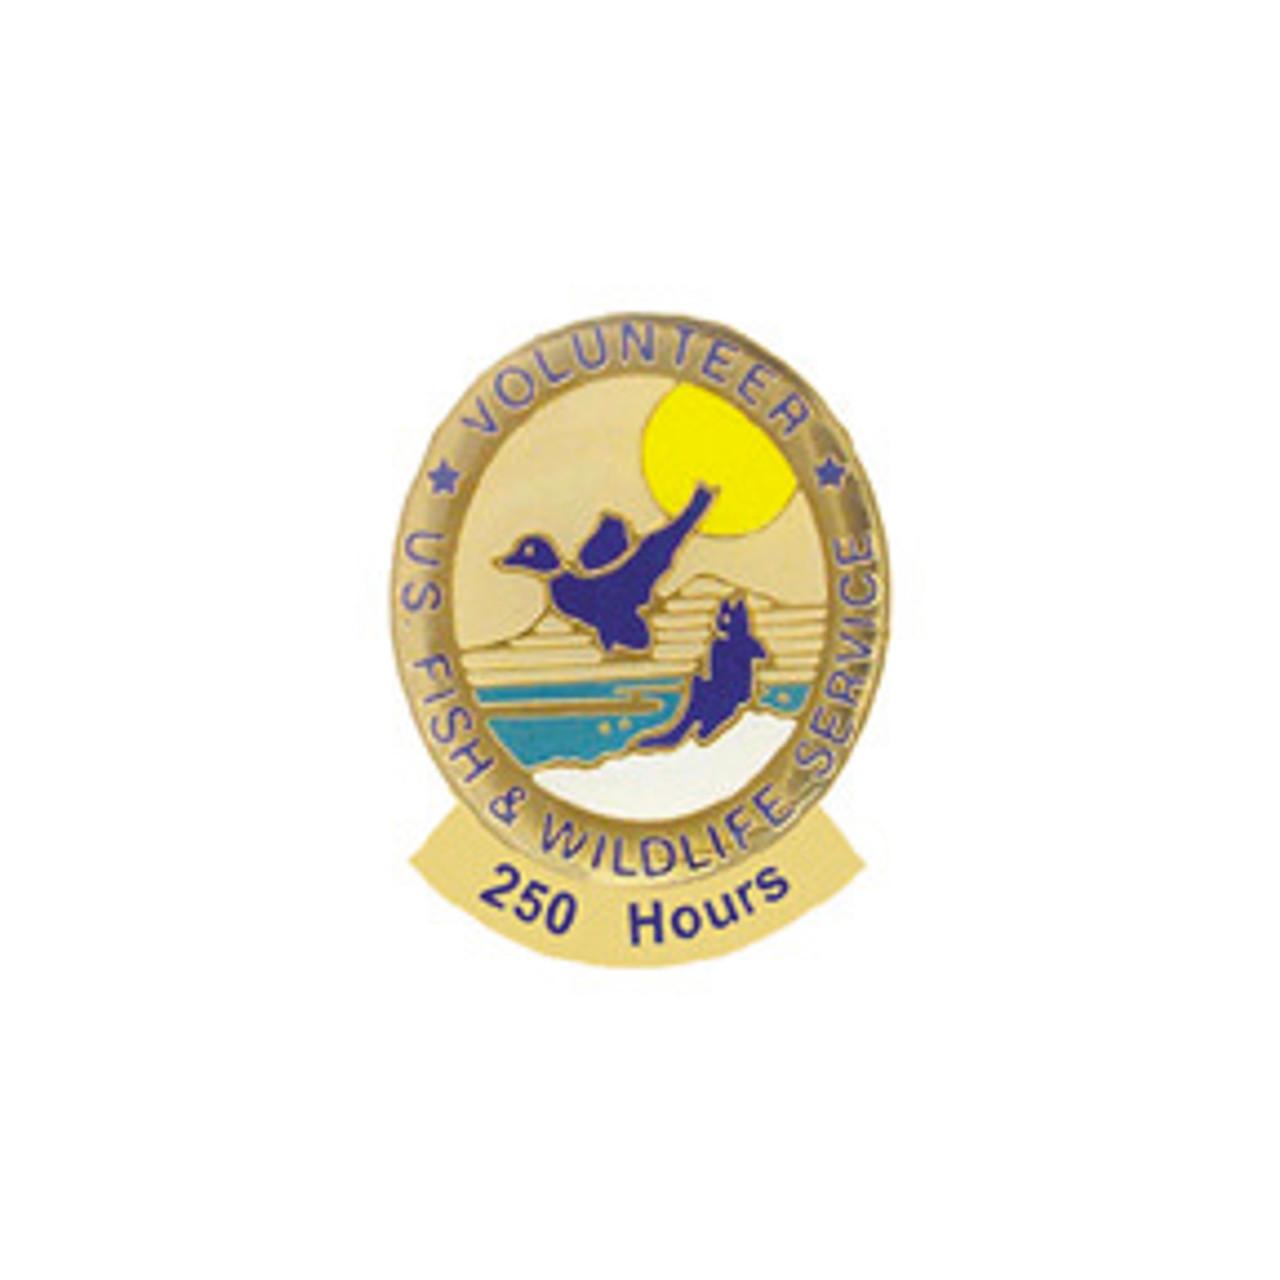 Fish & Wildlife Volunteer Hours Pin (5250 hours)